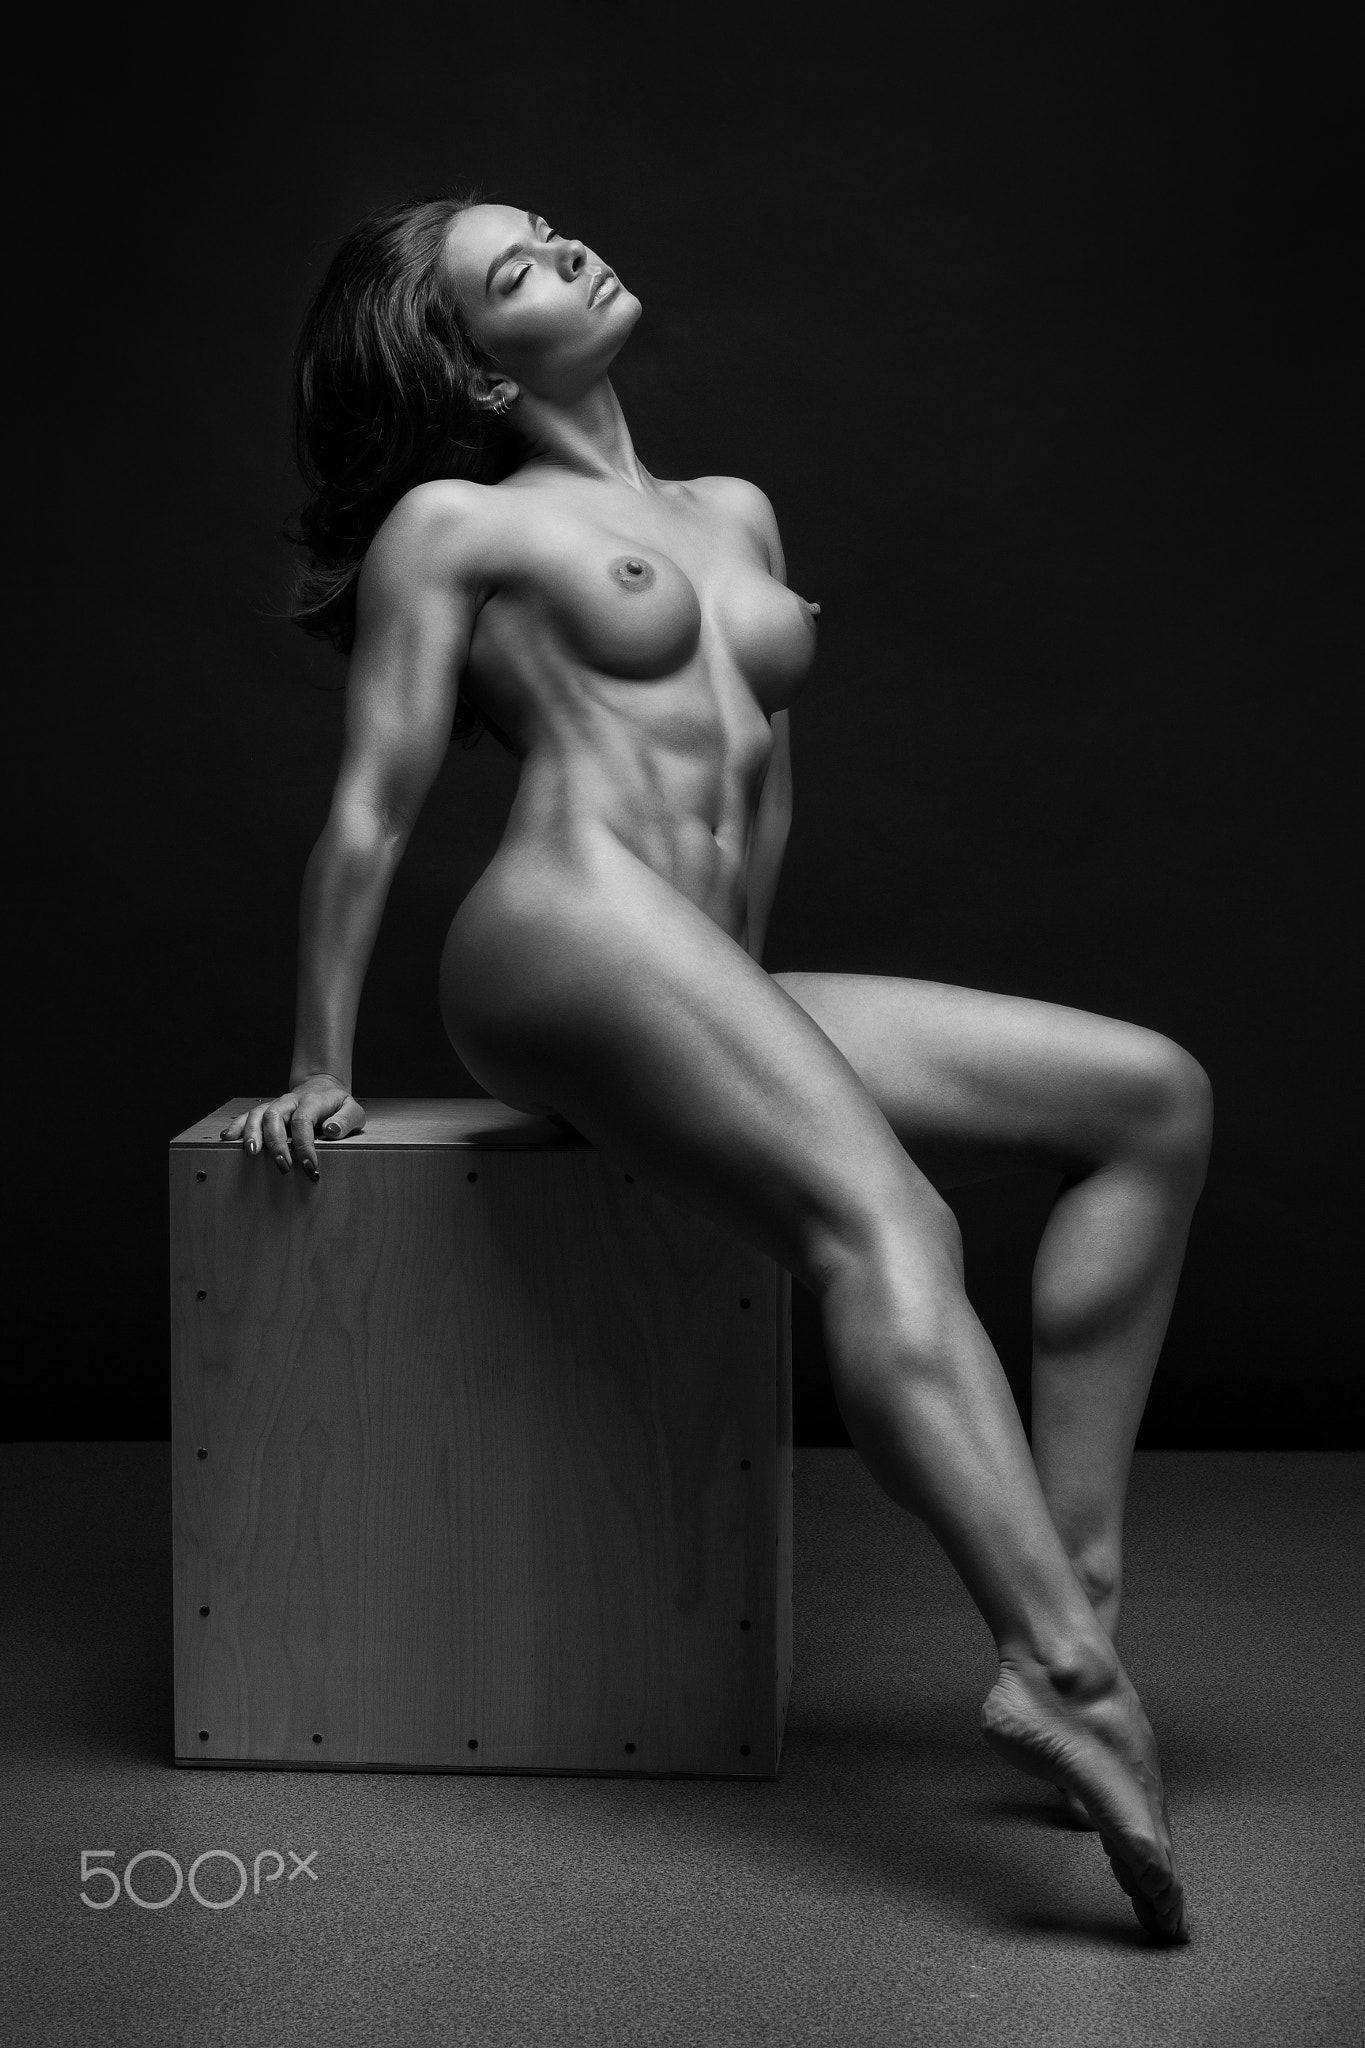 Lindsay sawyer nackt